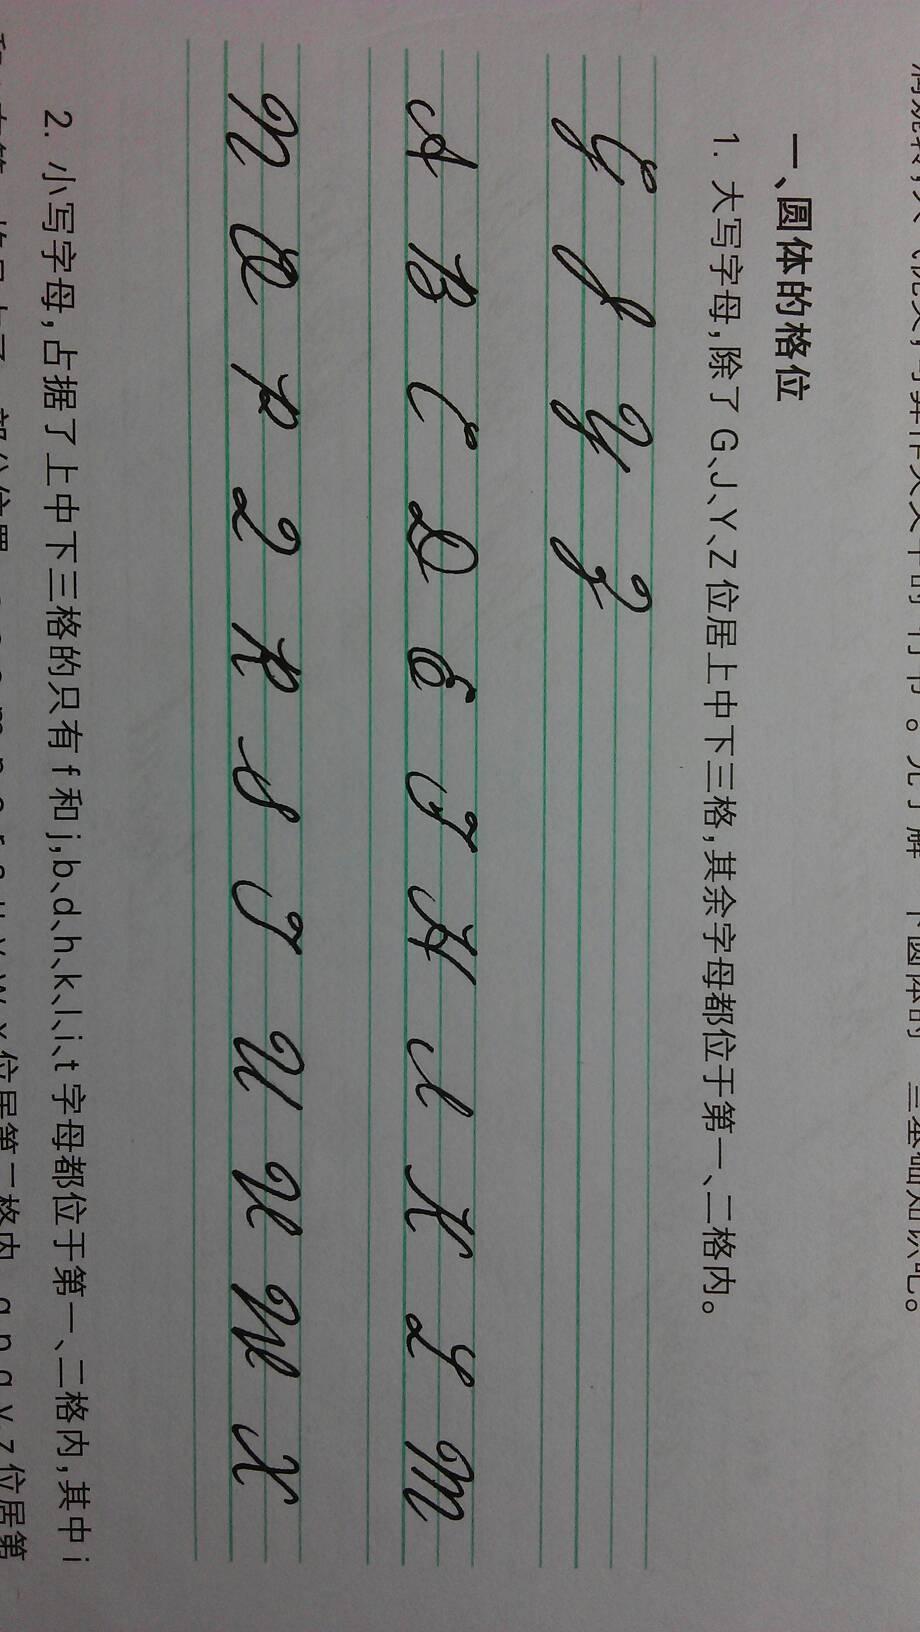 t 英语字母 的笔顺